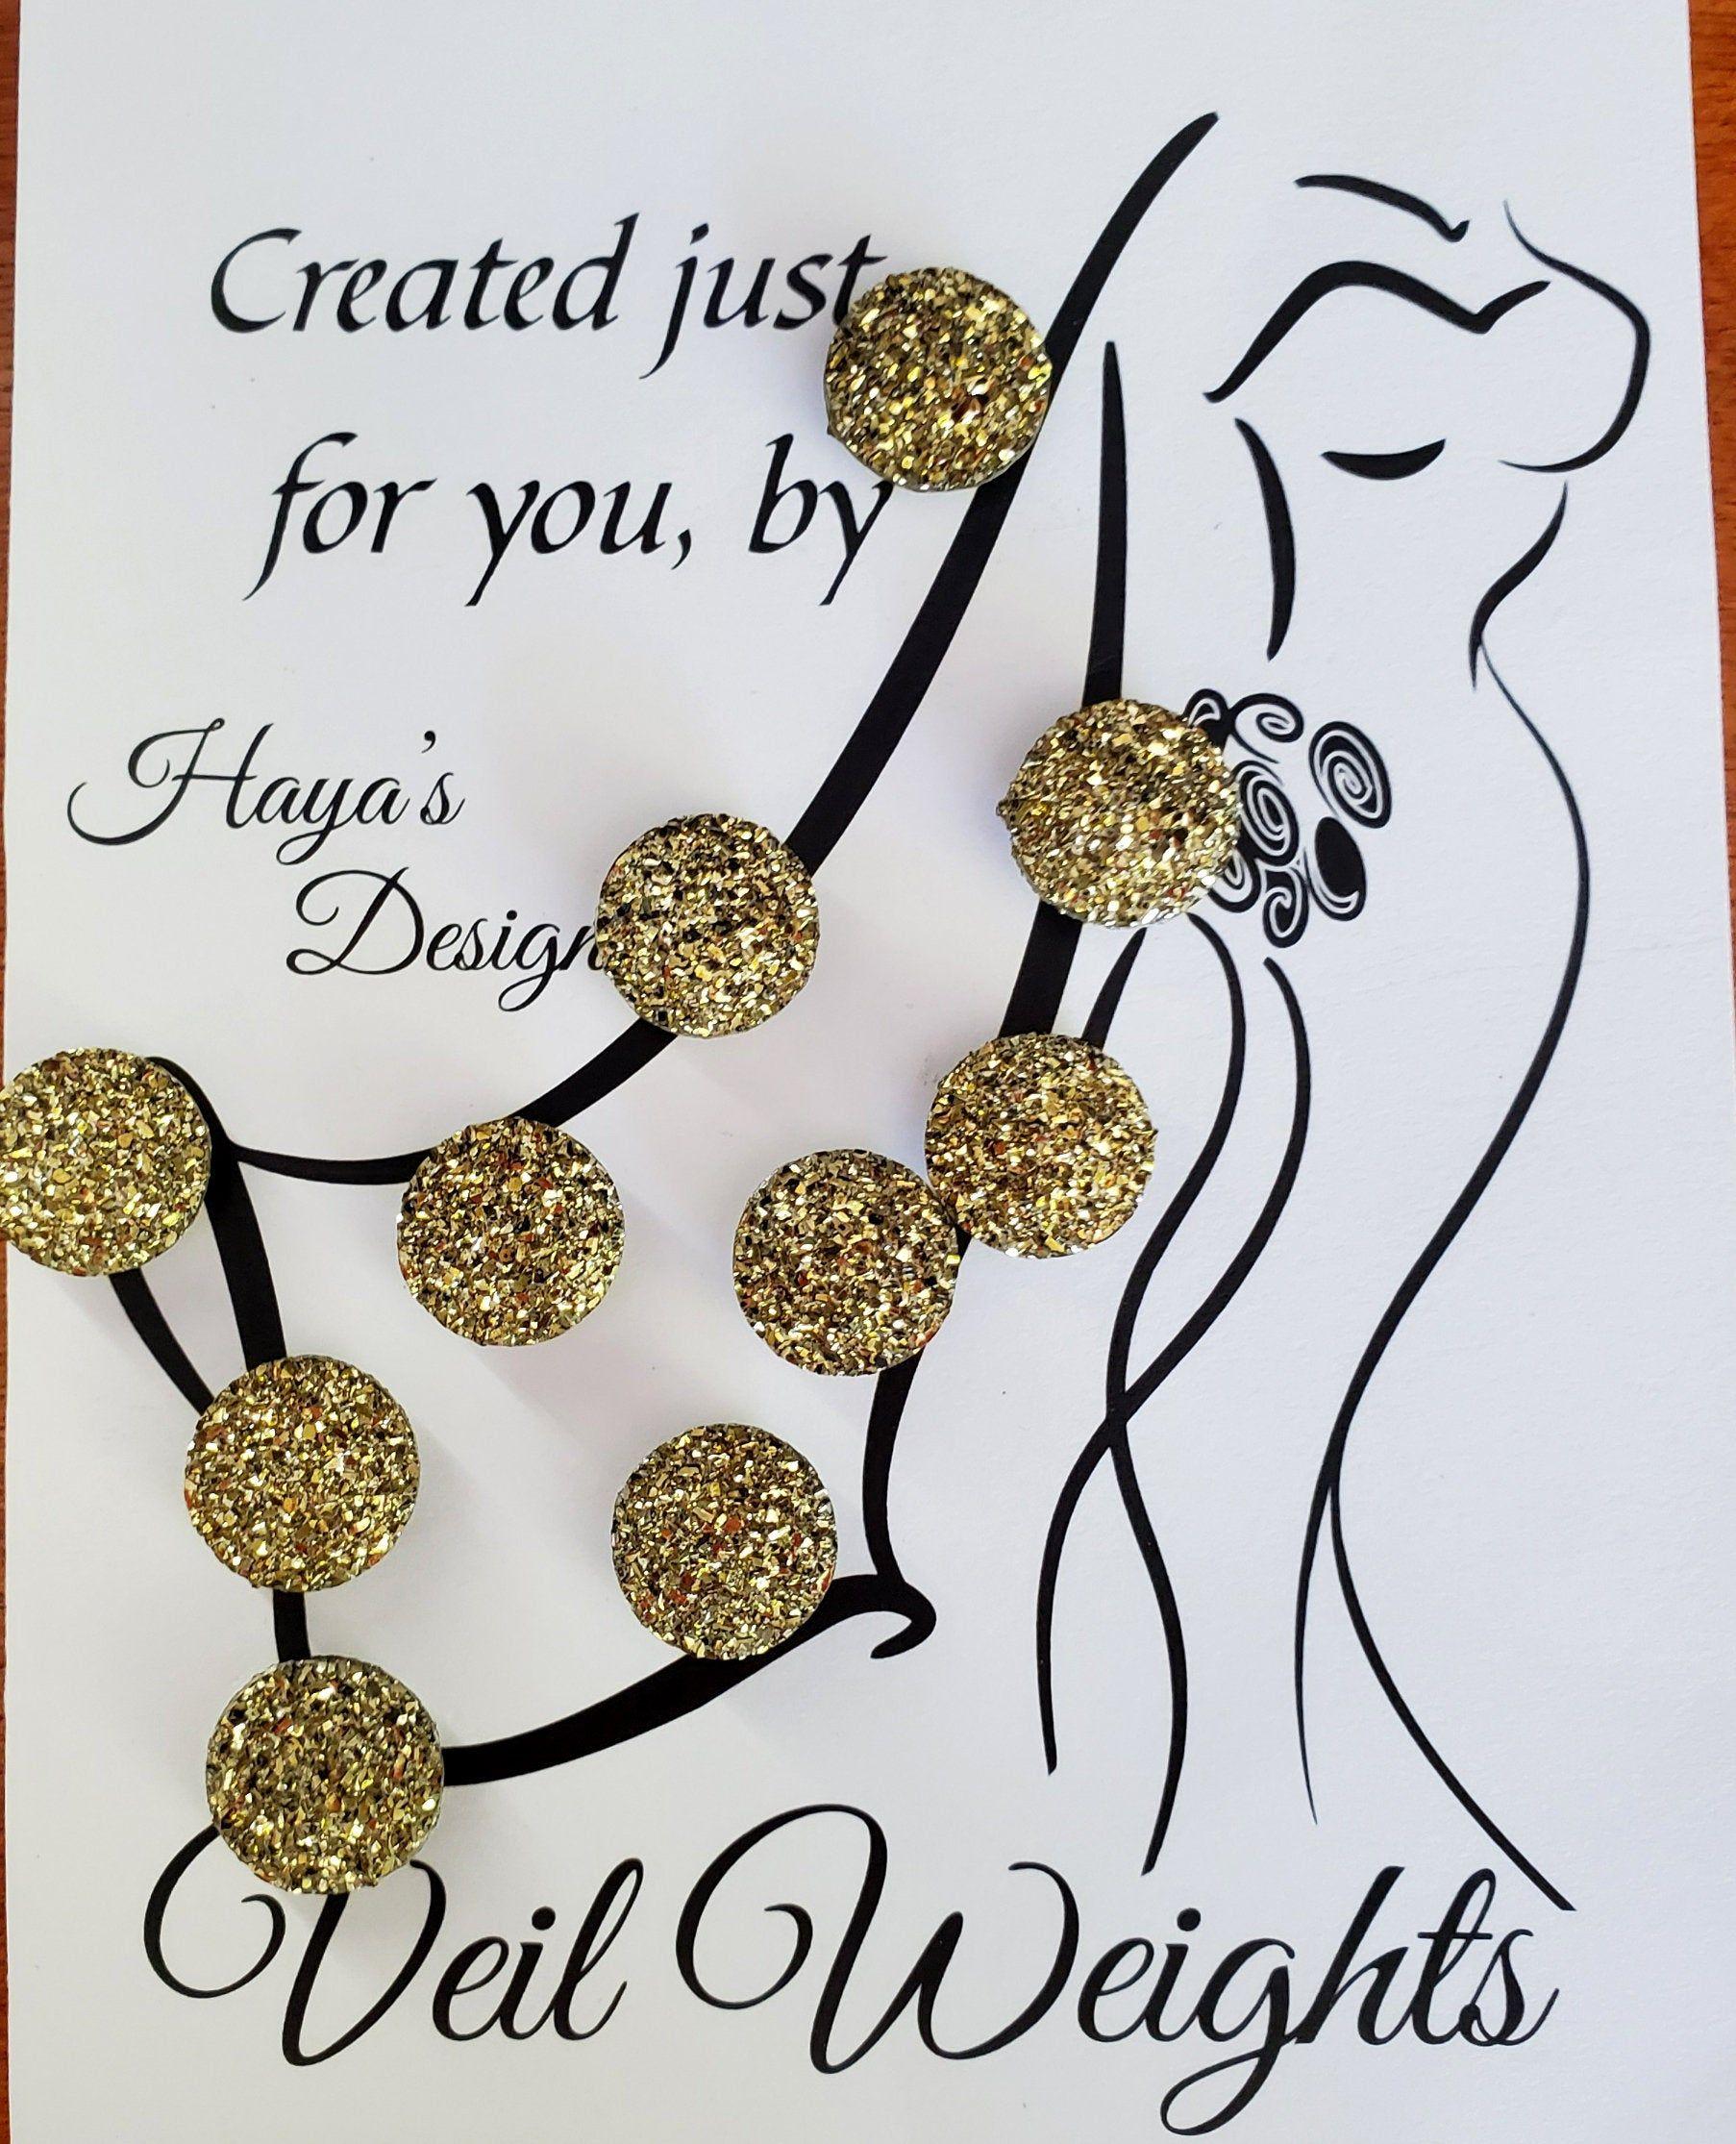 6 x Faux Ivory Pearl Hair Jewels Spirals Twists Coils Wedding Bridal Accessory